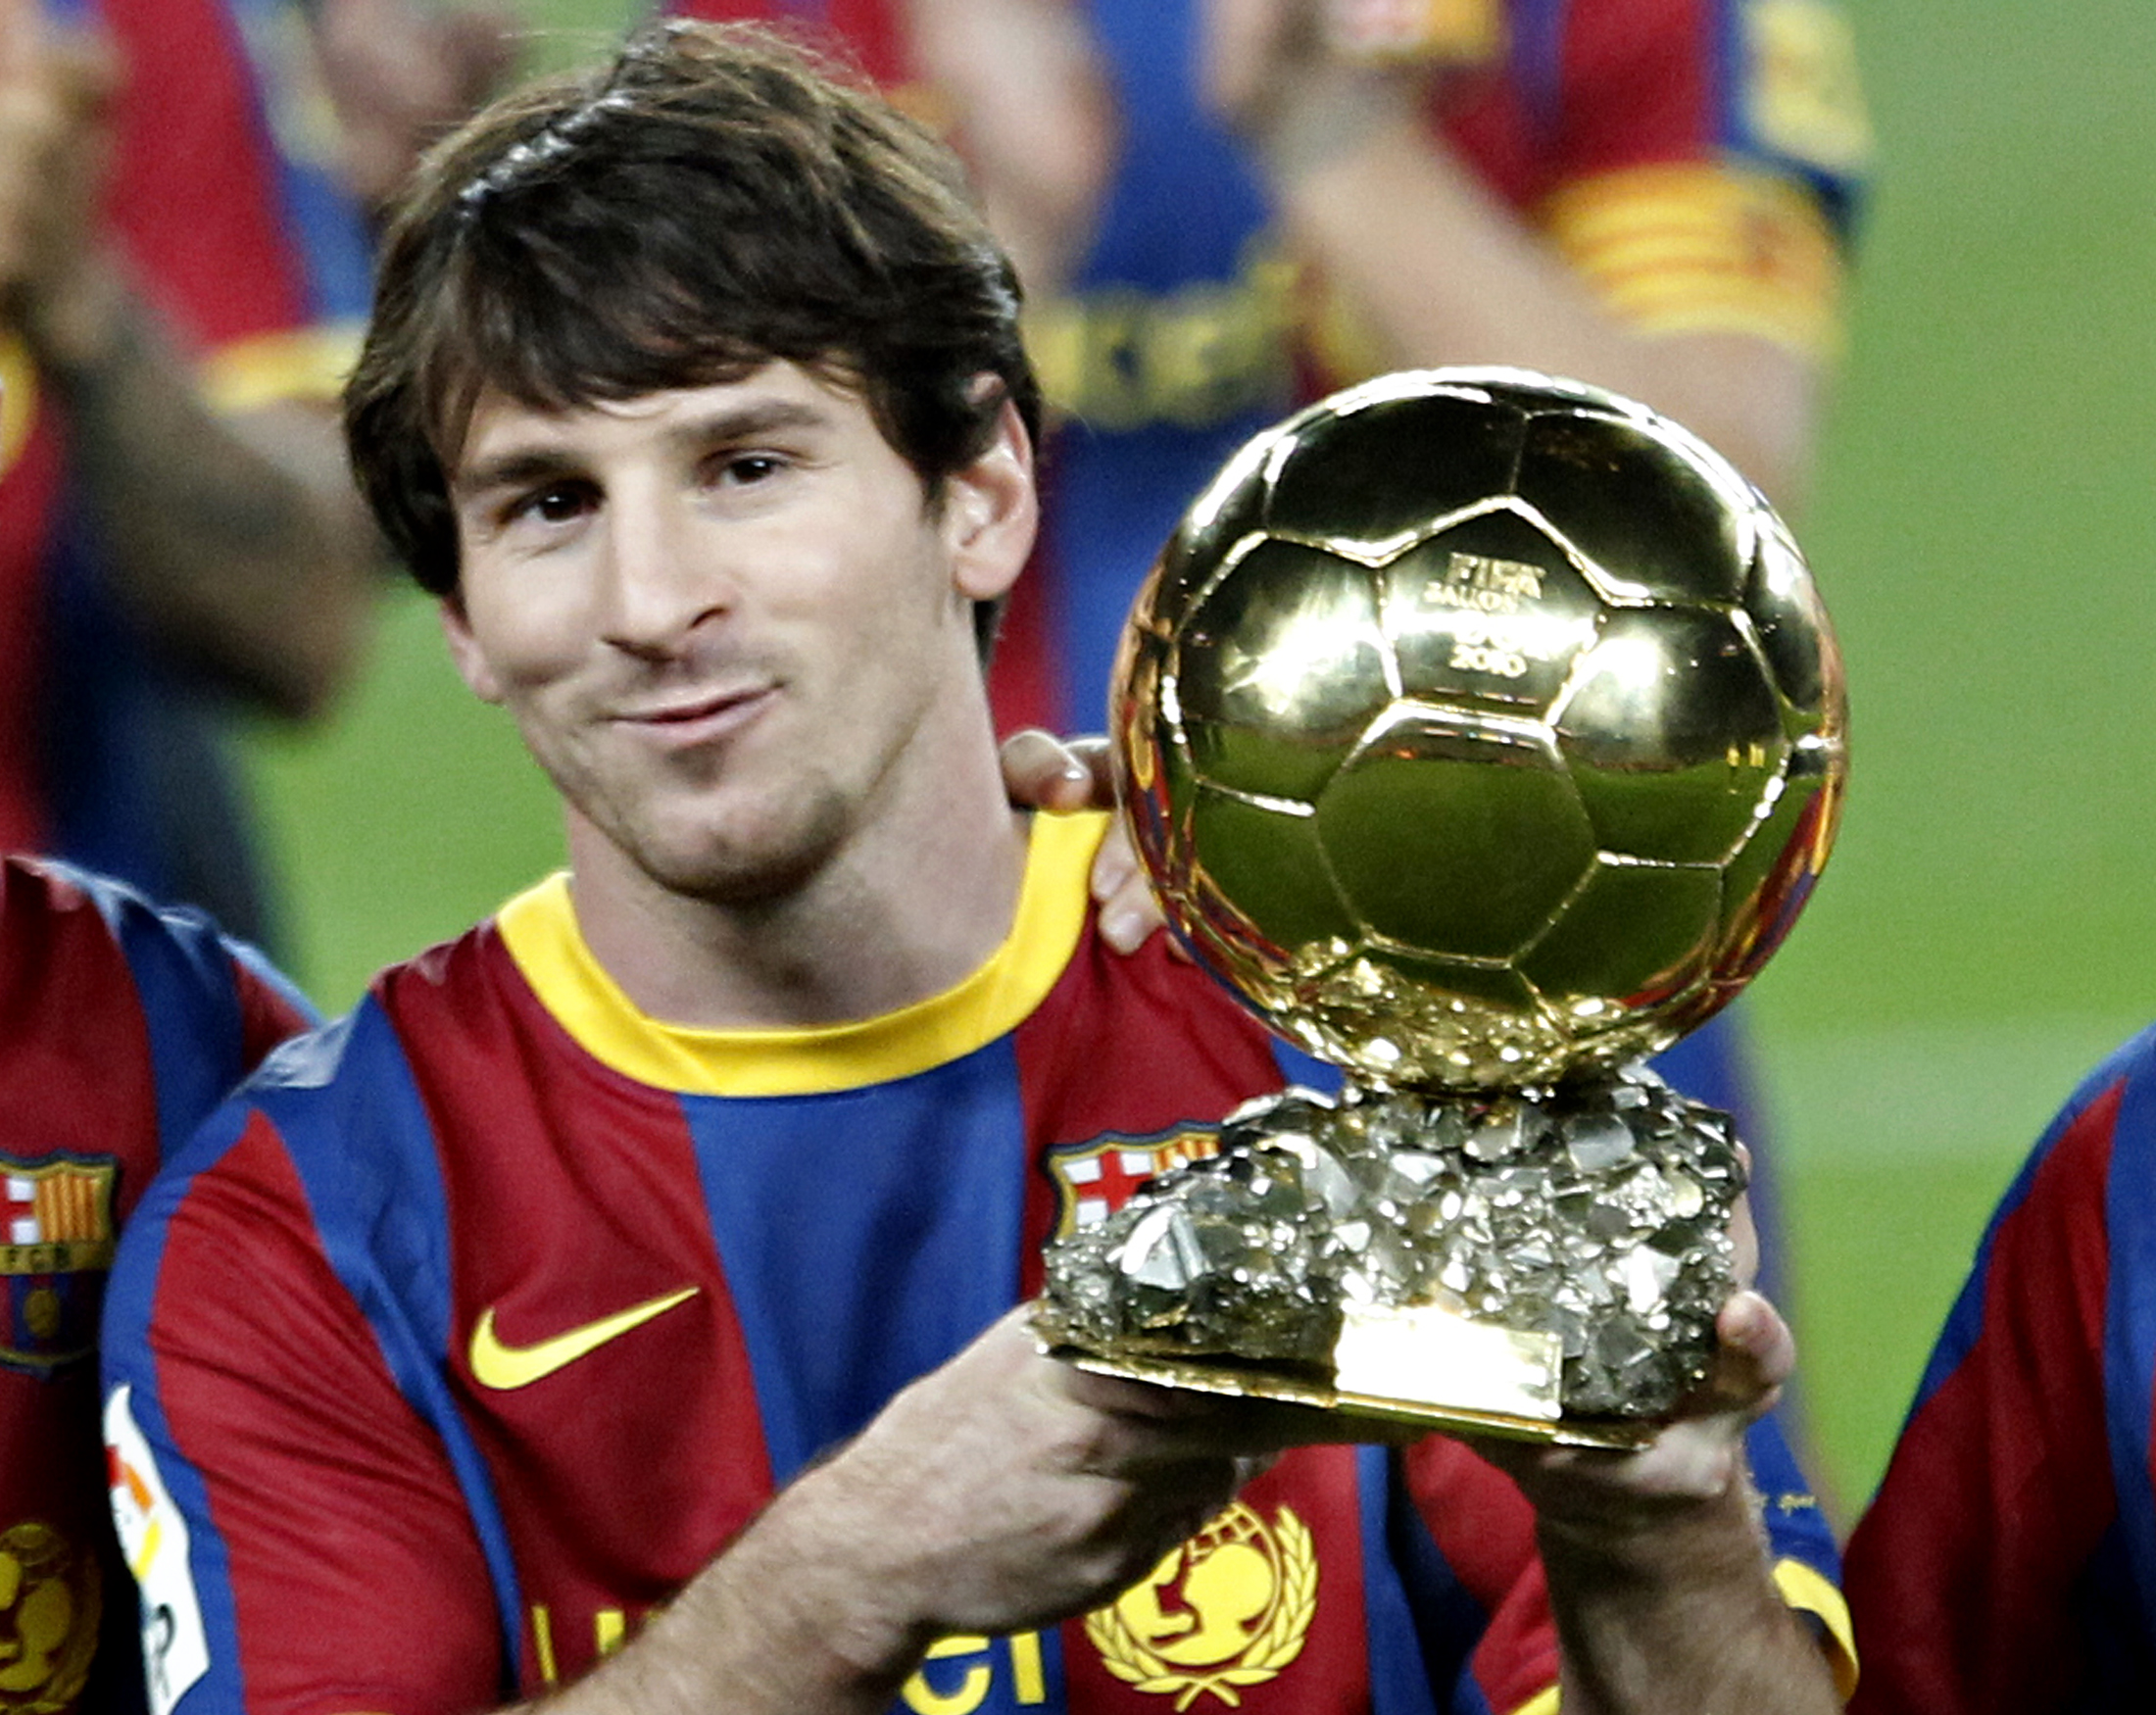 Hilo nico Leo Messi vs CR7 Historia palmars vdeos noticias